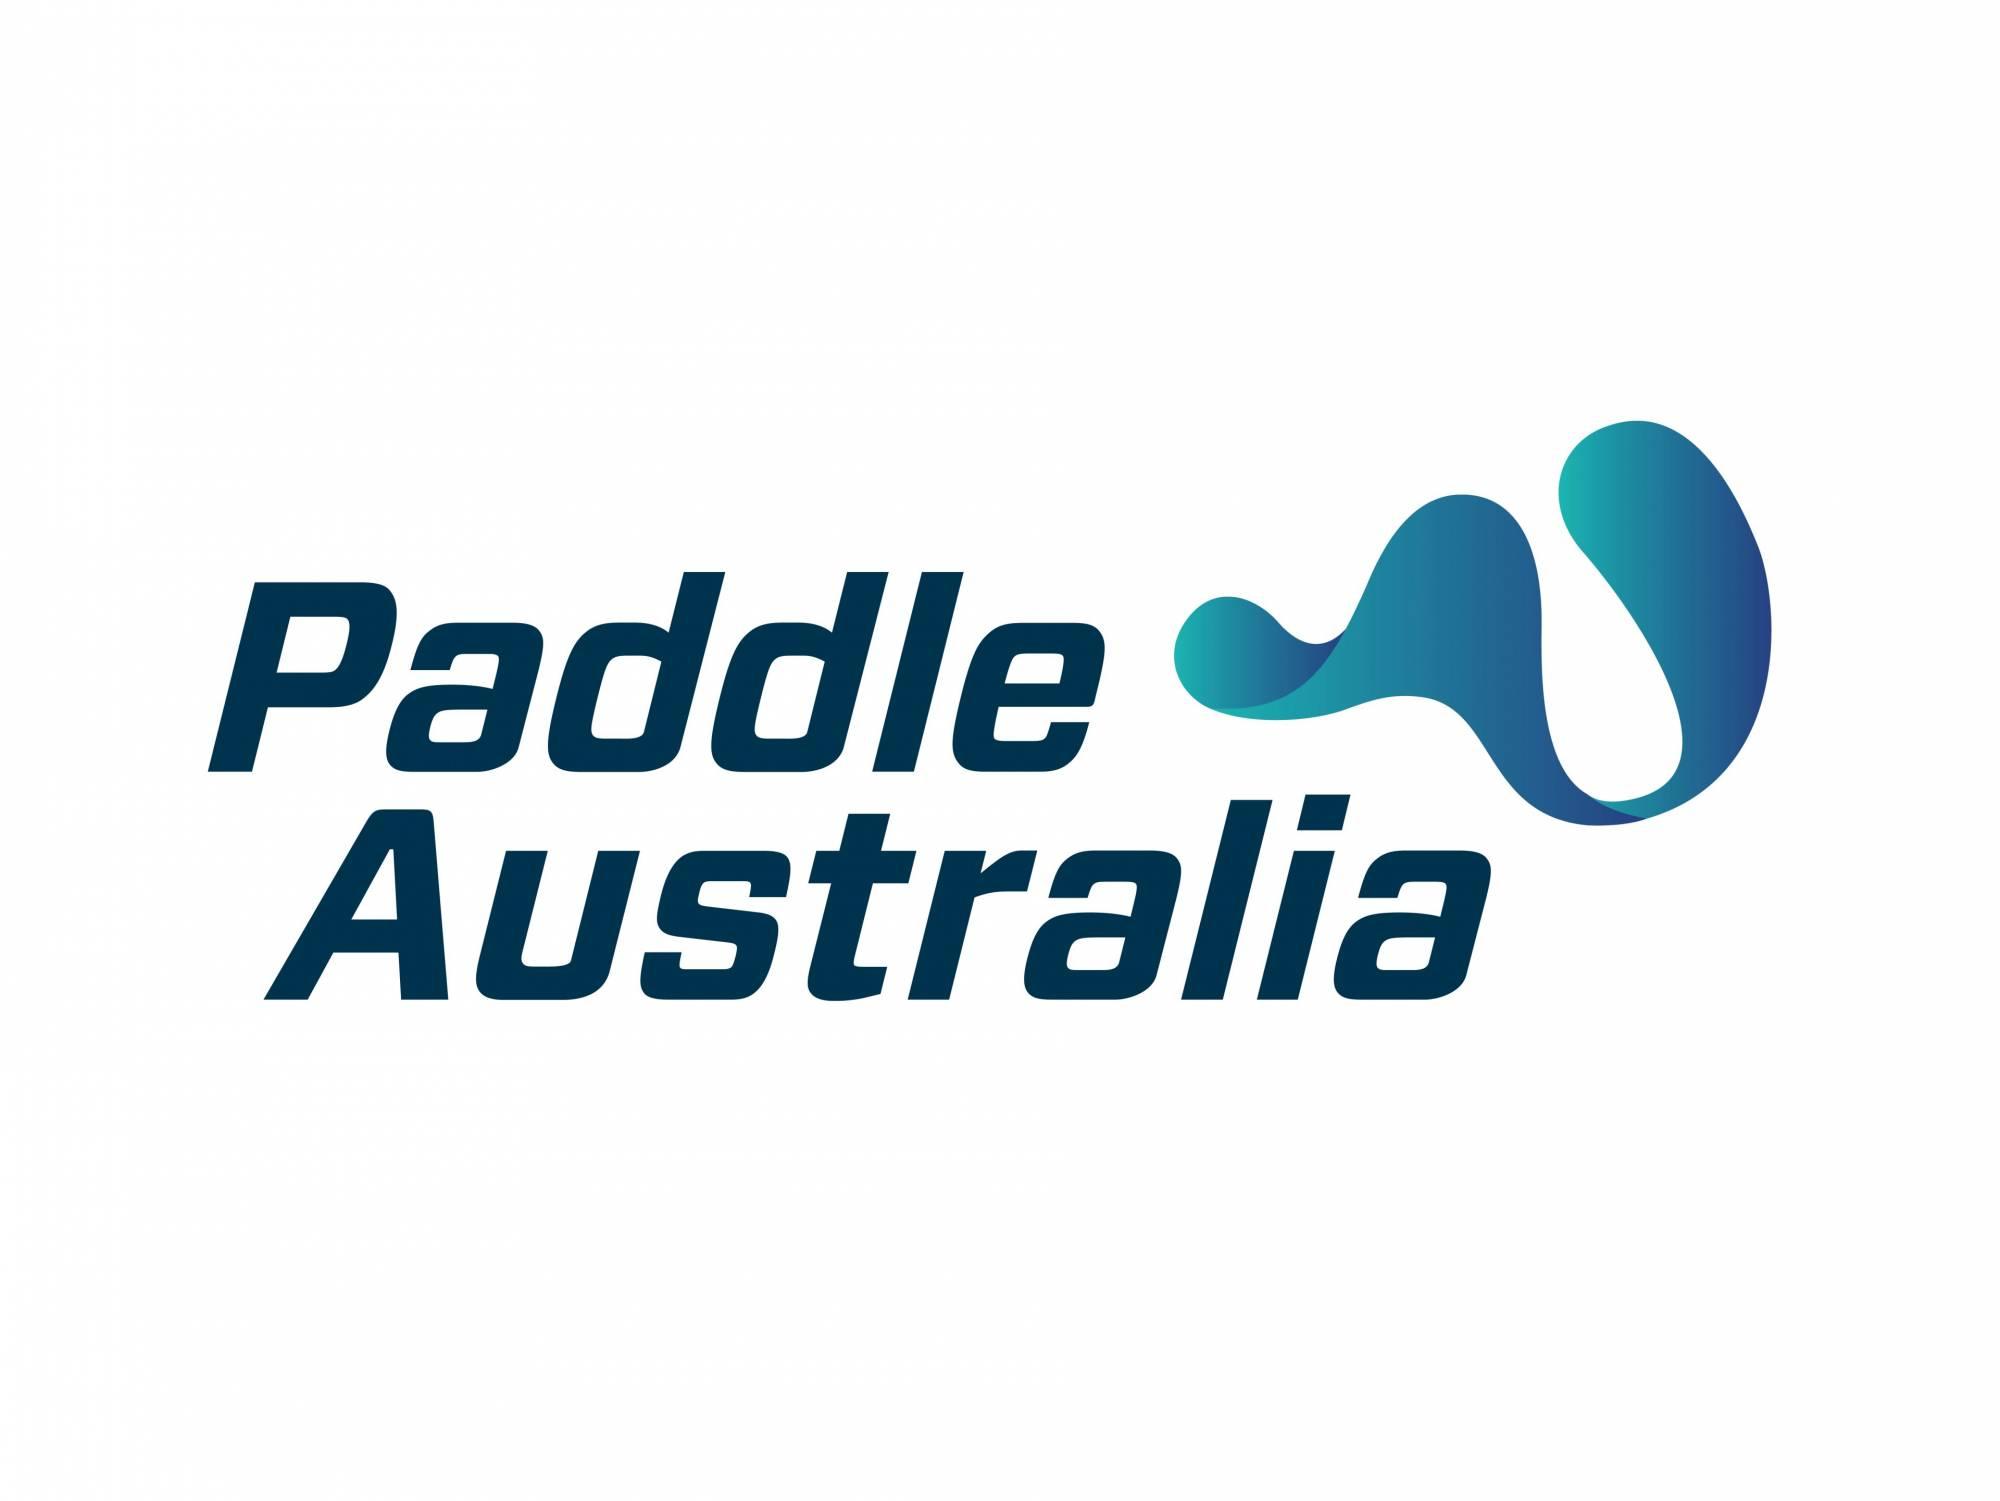 Paddle Australia Brand